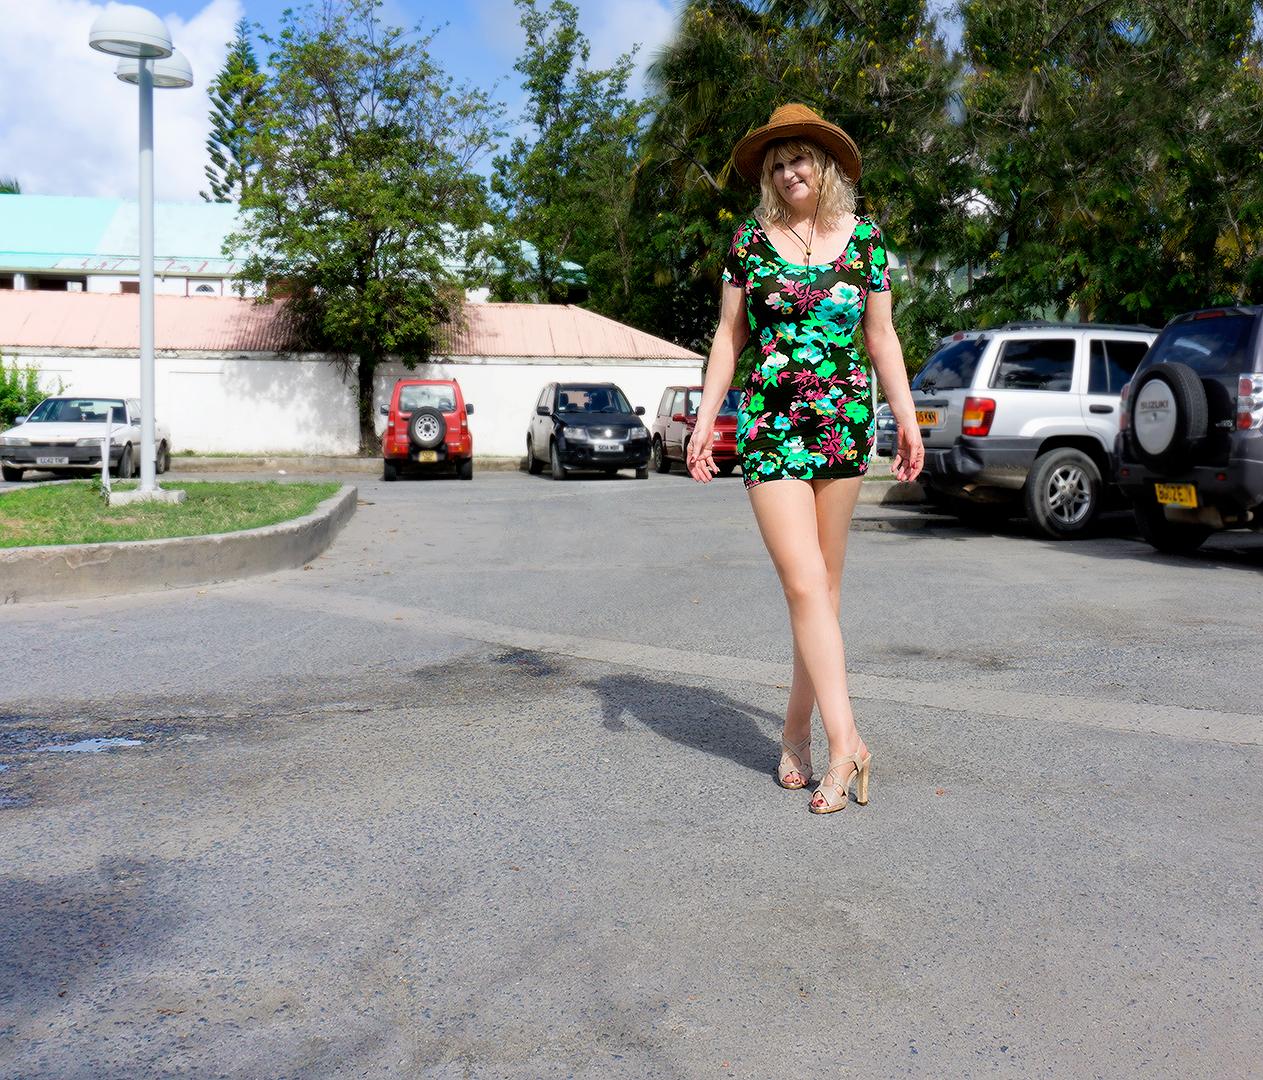 wallpaper blonde street car minidress legs shorts. Black Bedroom Furniture Sets. Home Design Ideas